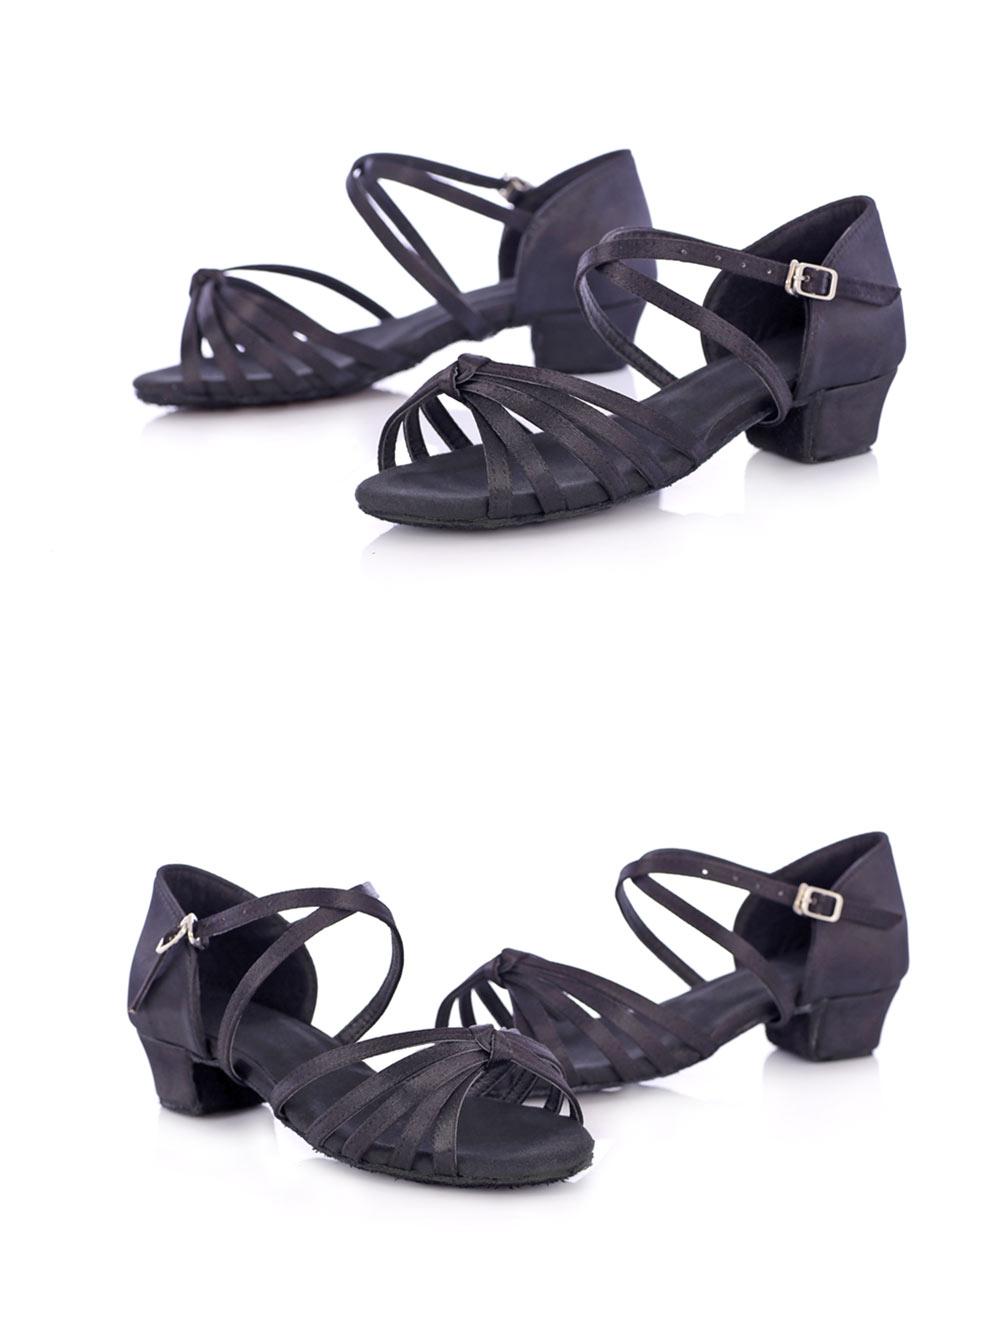 New Arrival Ballroom Tango Latin Dance Shoes High Quality Latin Woman Dancing Shoe Wholesale Women'S Heel Shoes Fast Shipping (11)